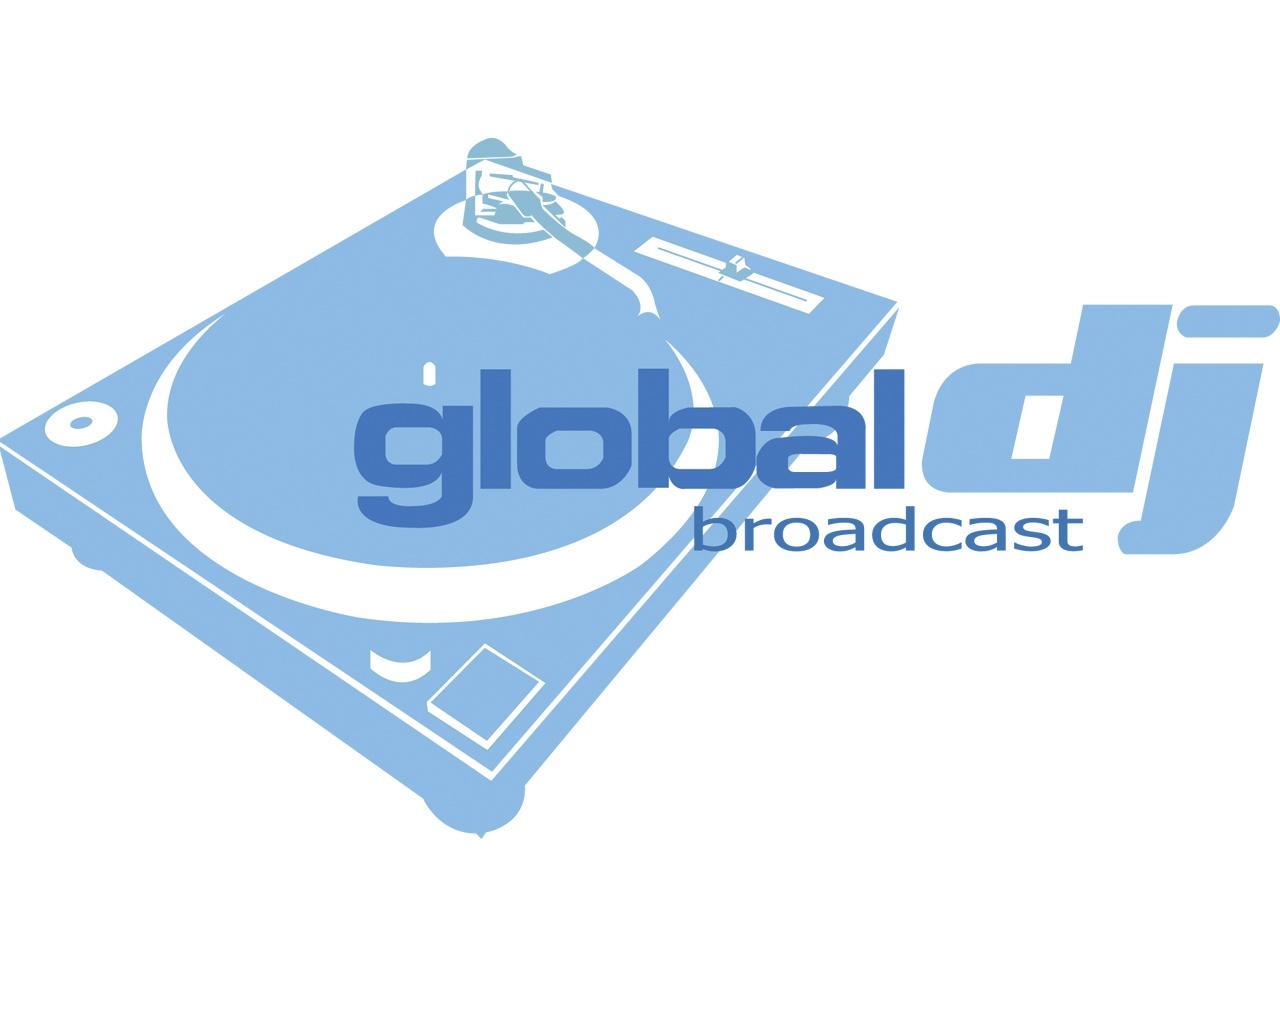 global_dj_broadcast-1280x1024.jpg